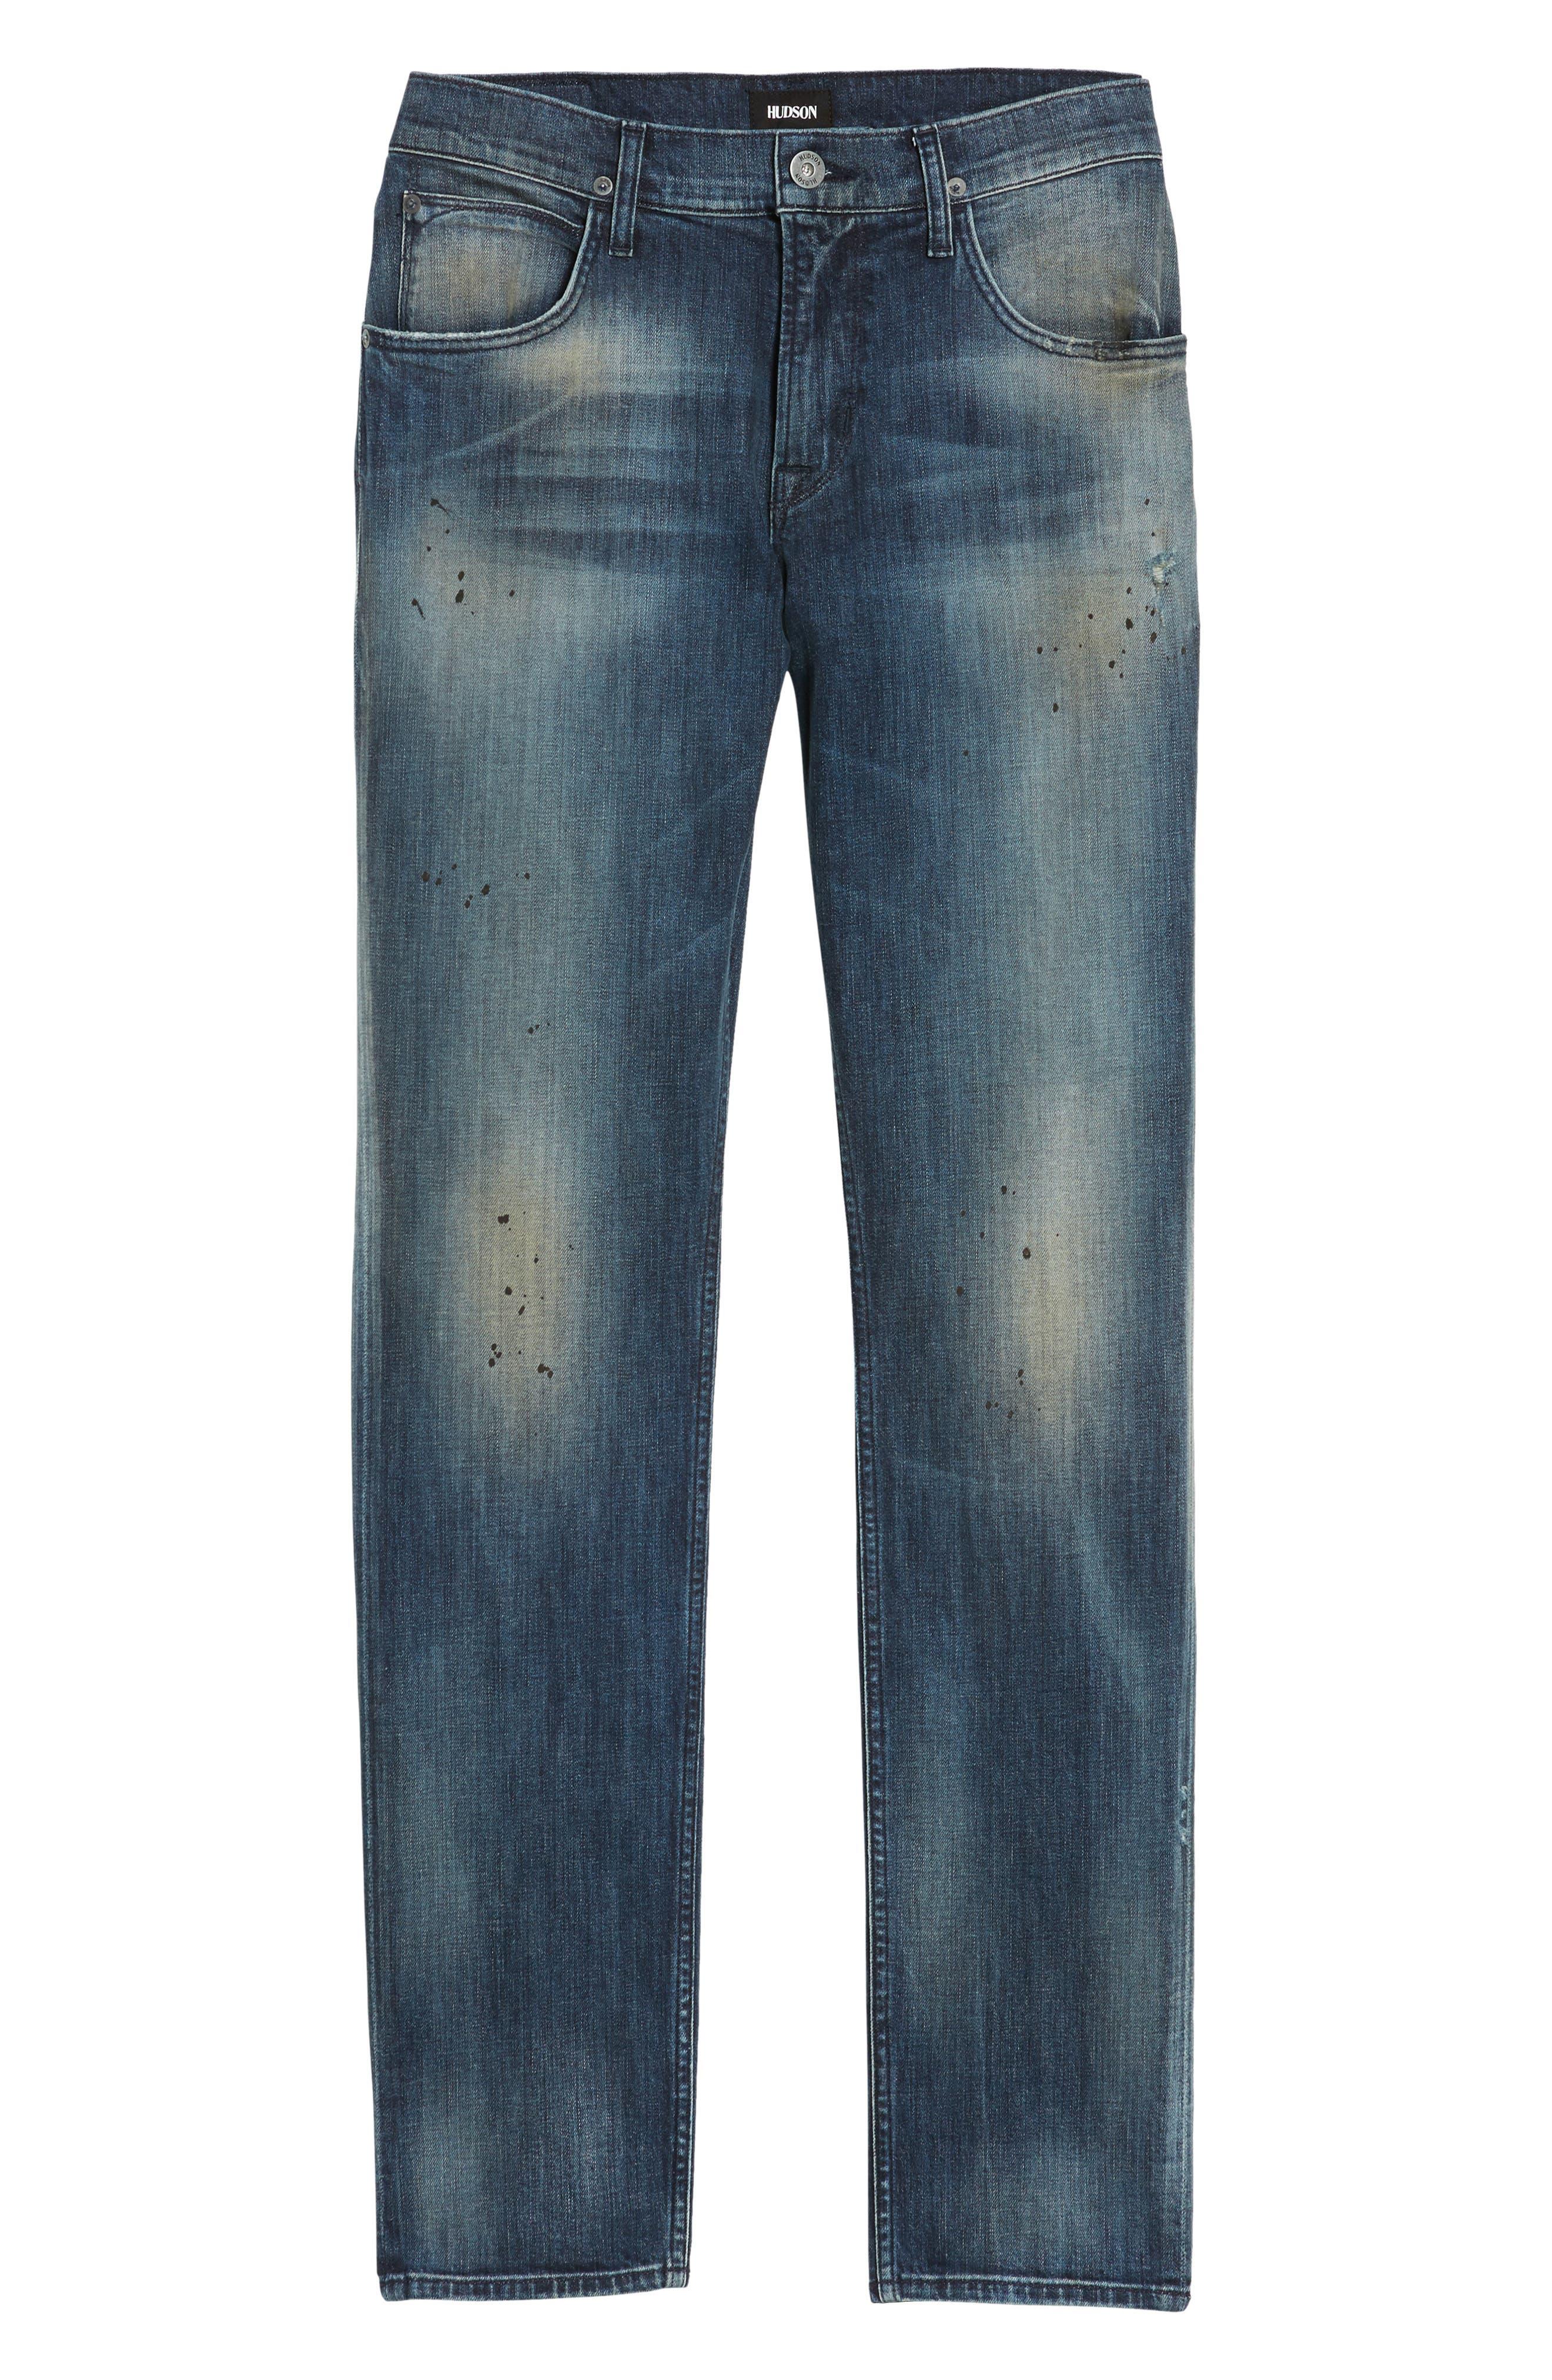 Blake Slim Fit Jeans,                             Alternate thumbnail 6, color,                             425